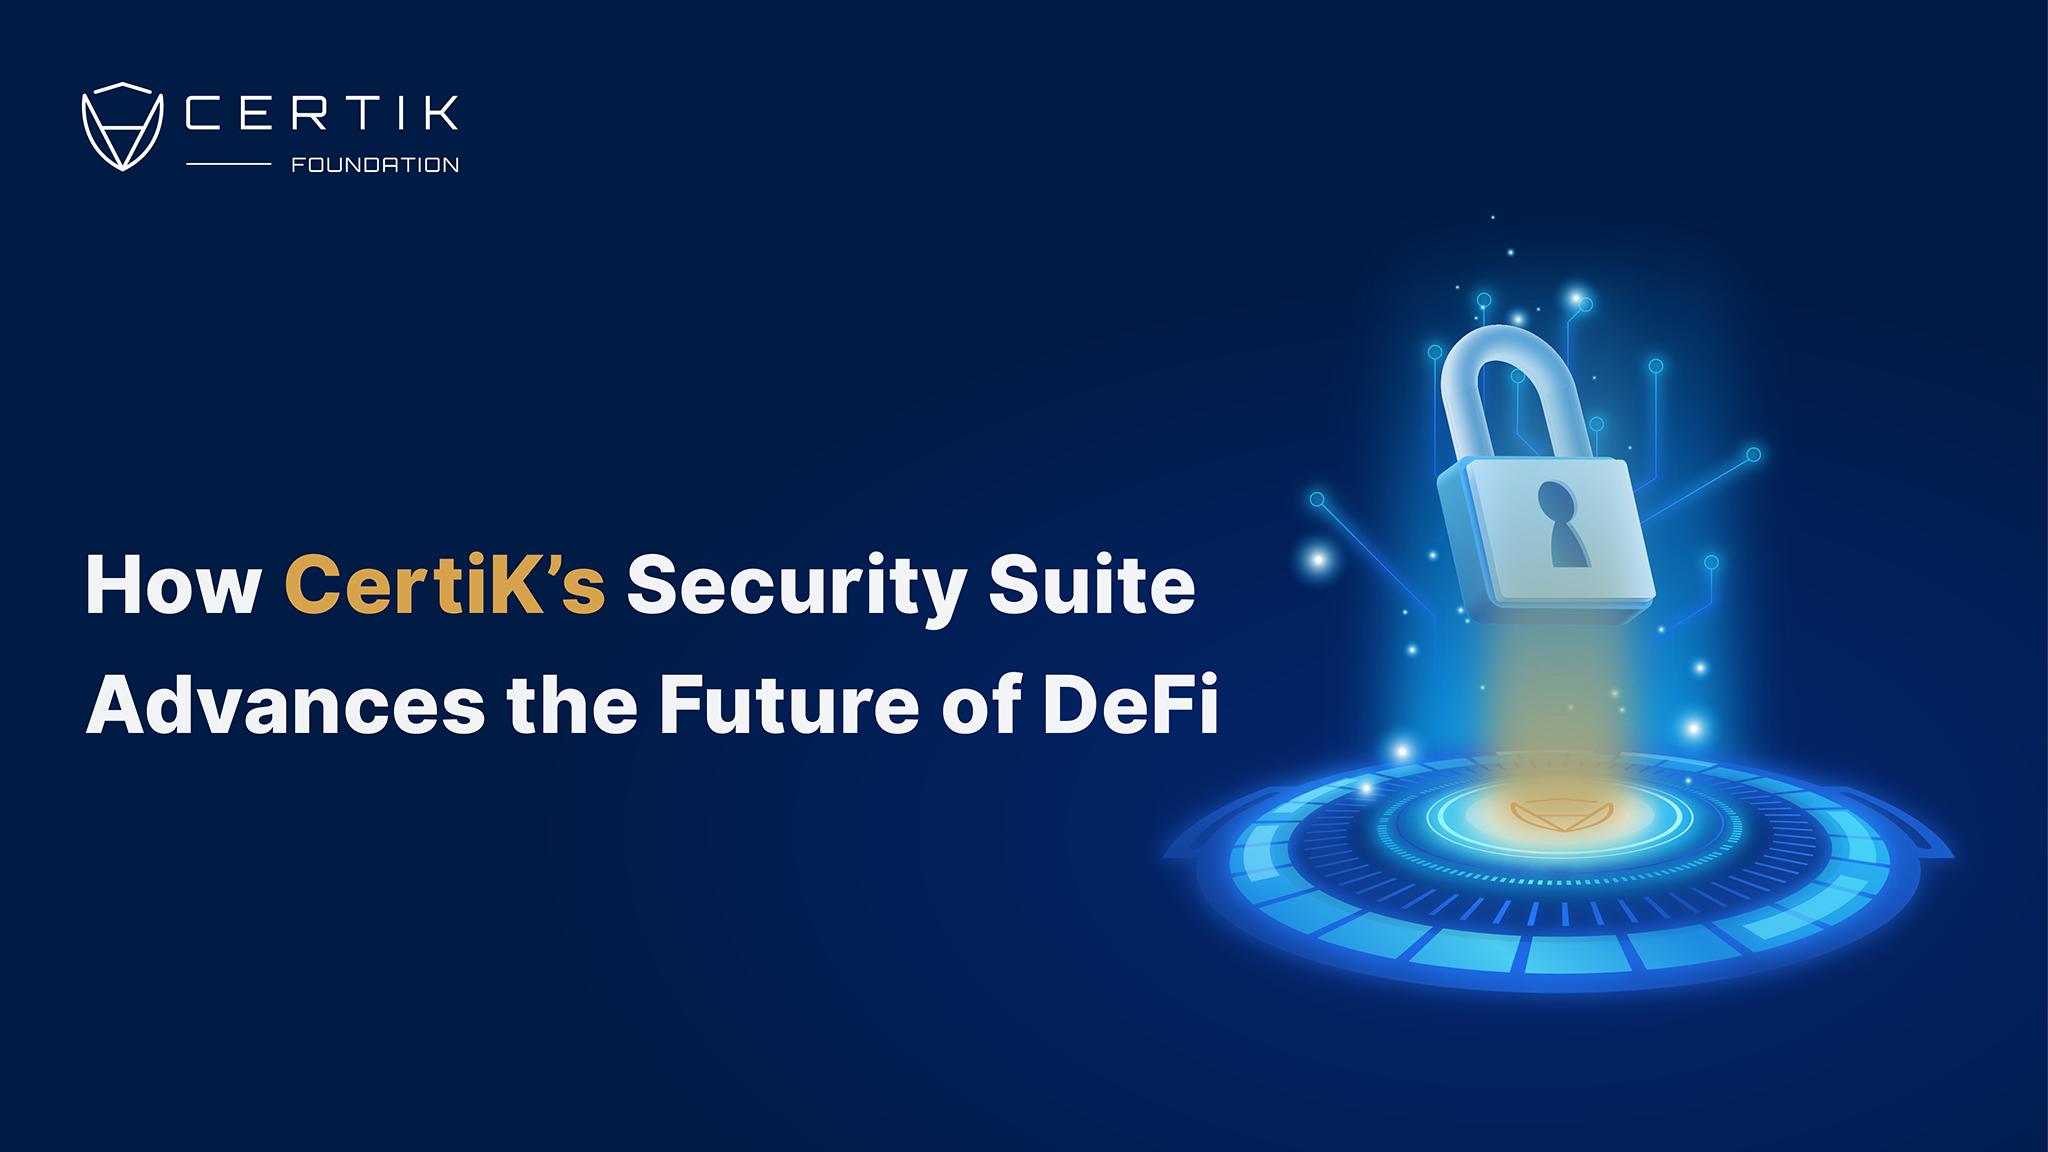 How CertiK's Security Suite Advances the Future of DeFi